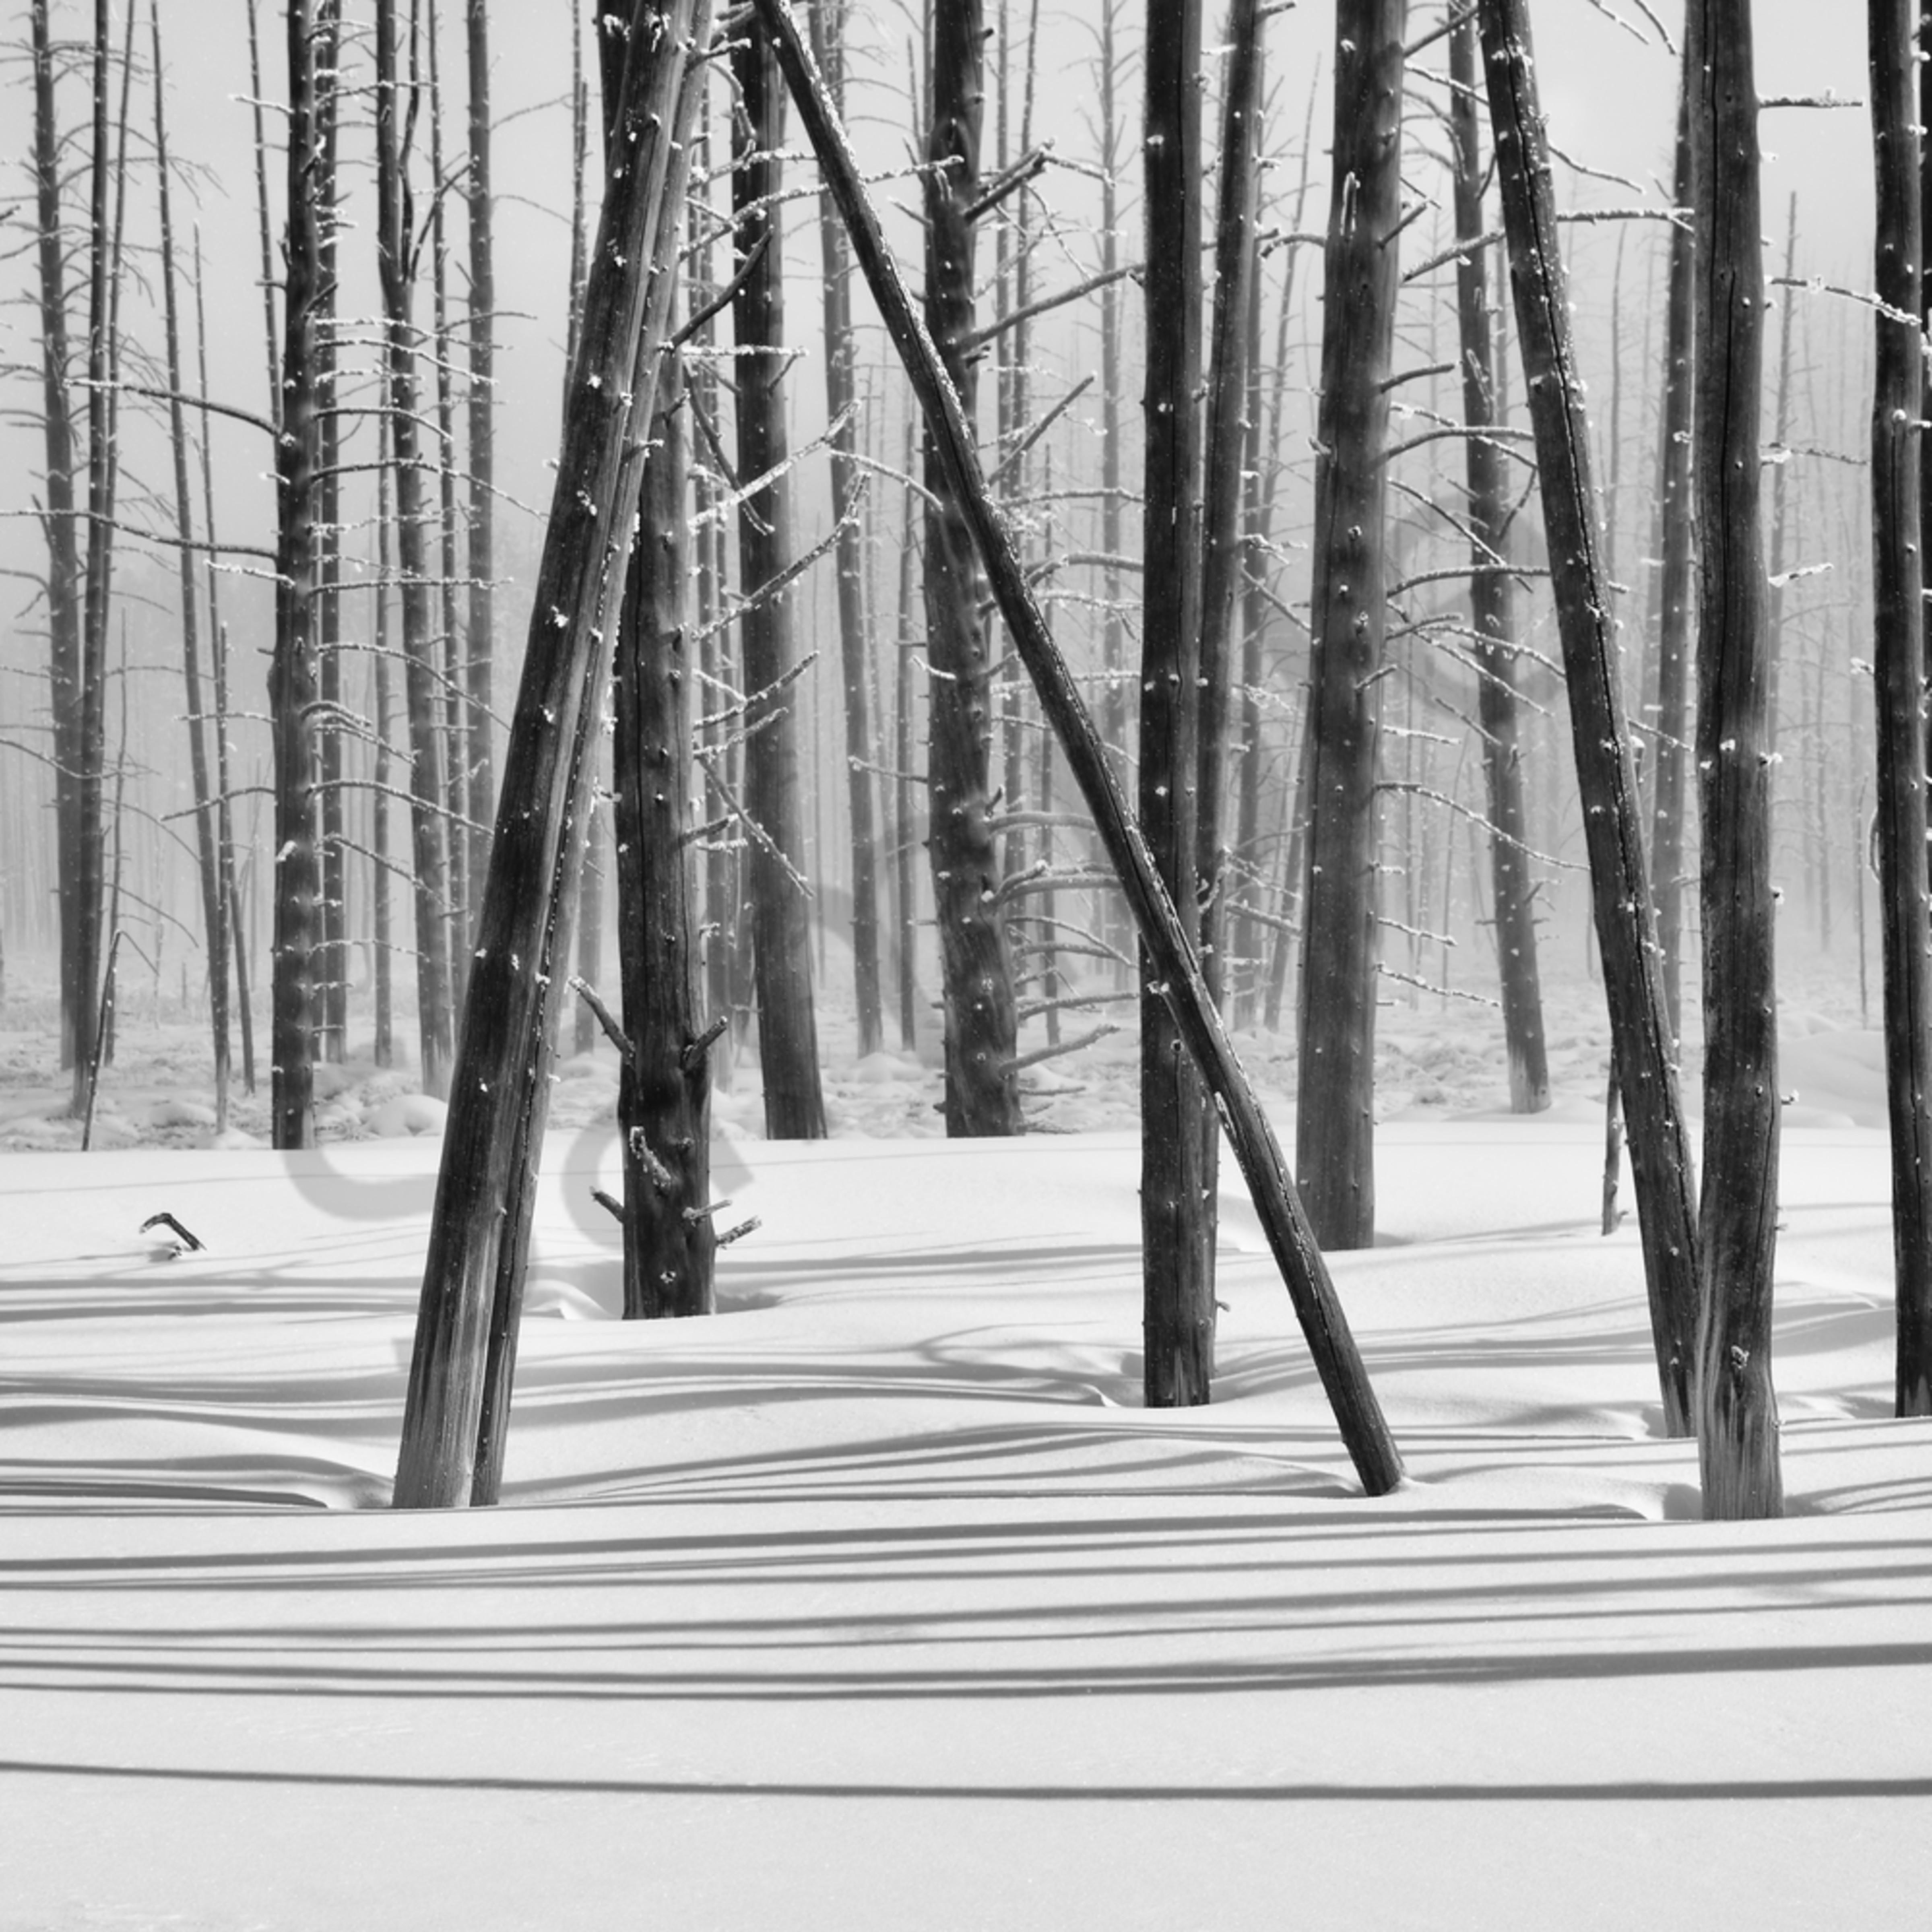 D85 2695 snowy woods 2020.02.18 hr ns bw ywvlnn